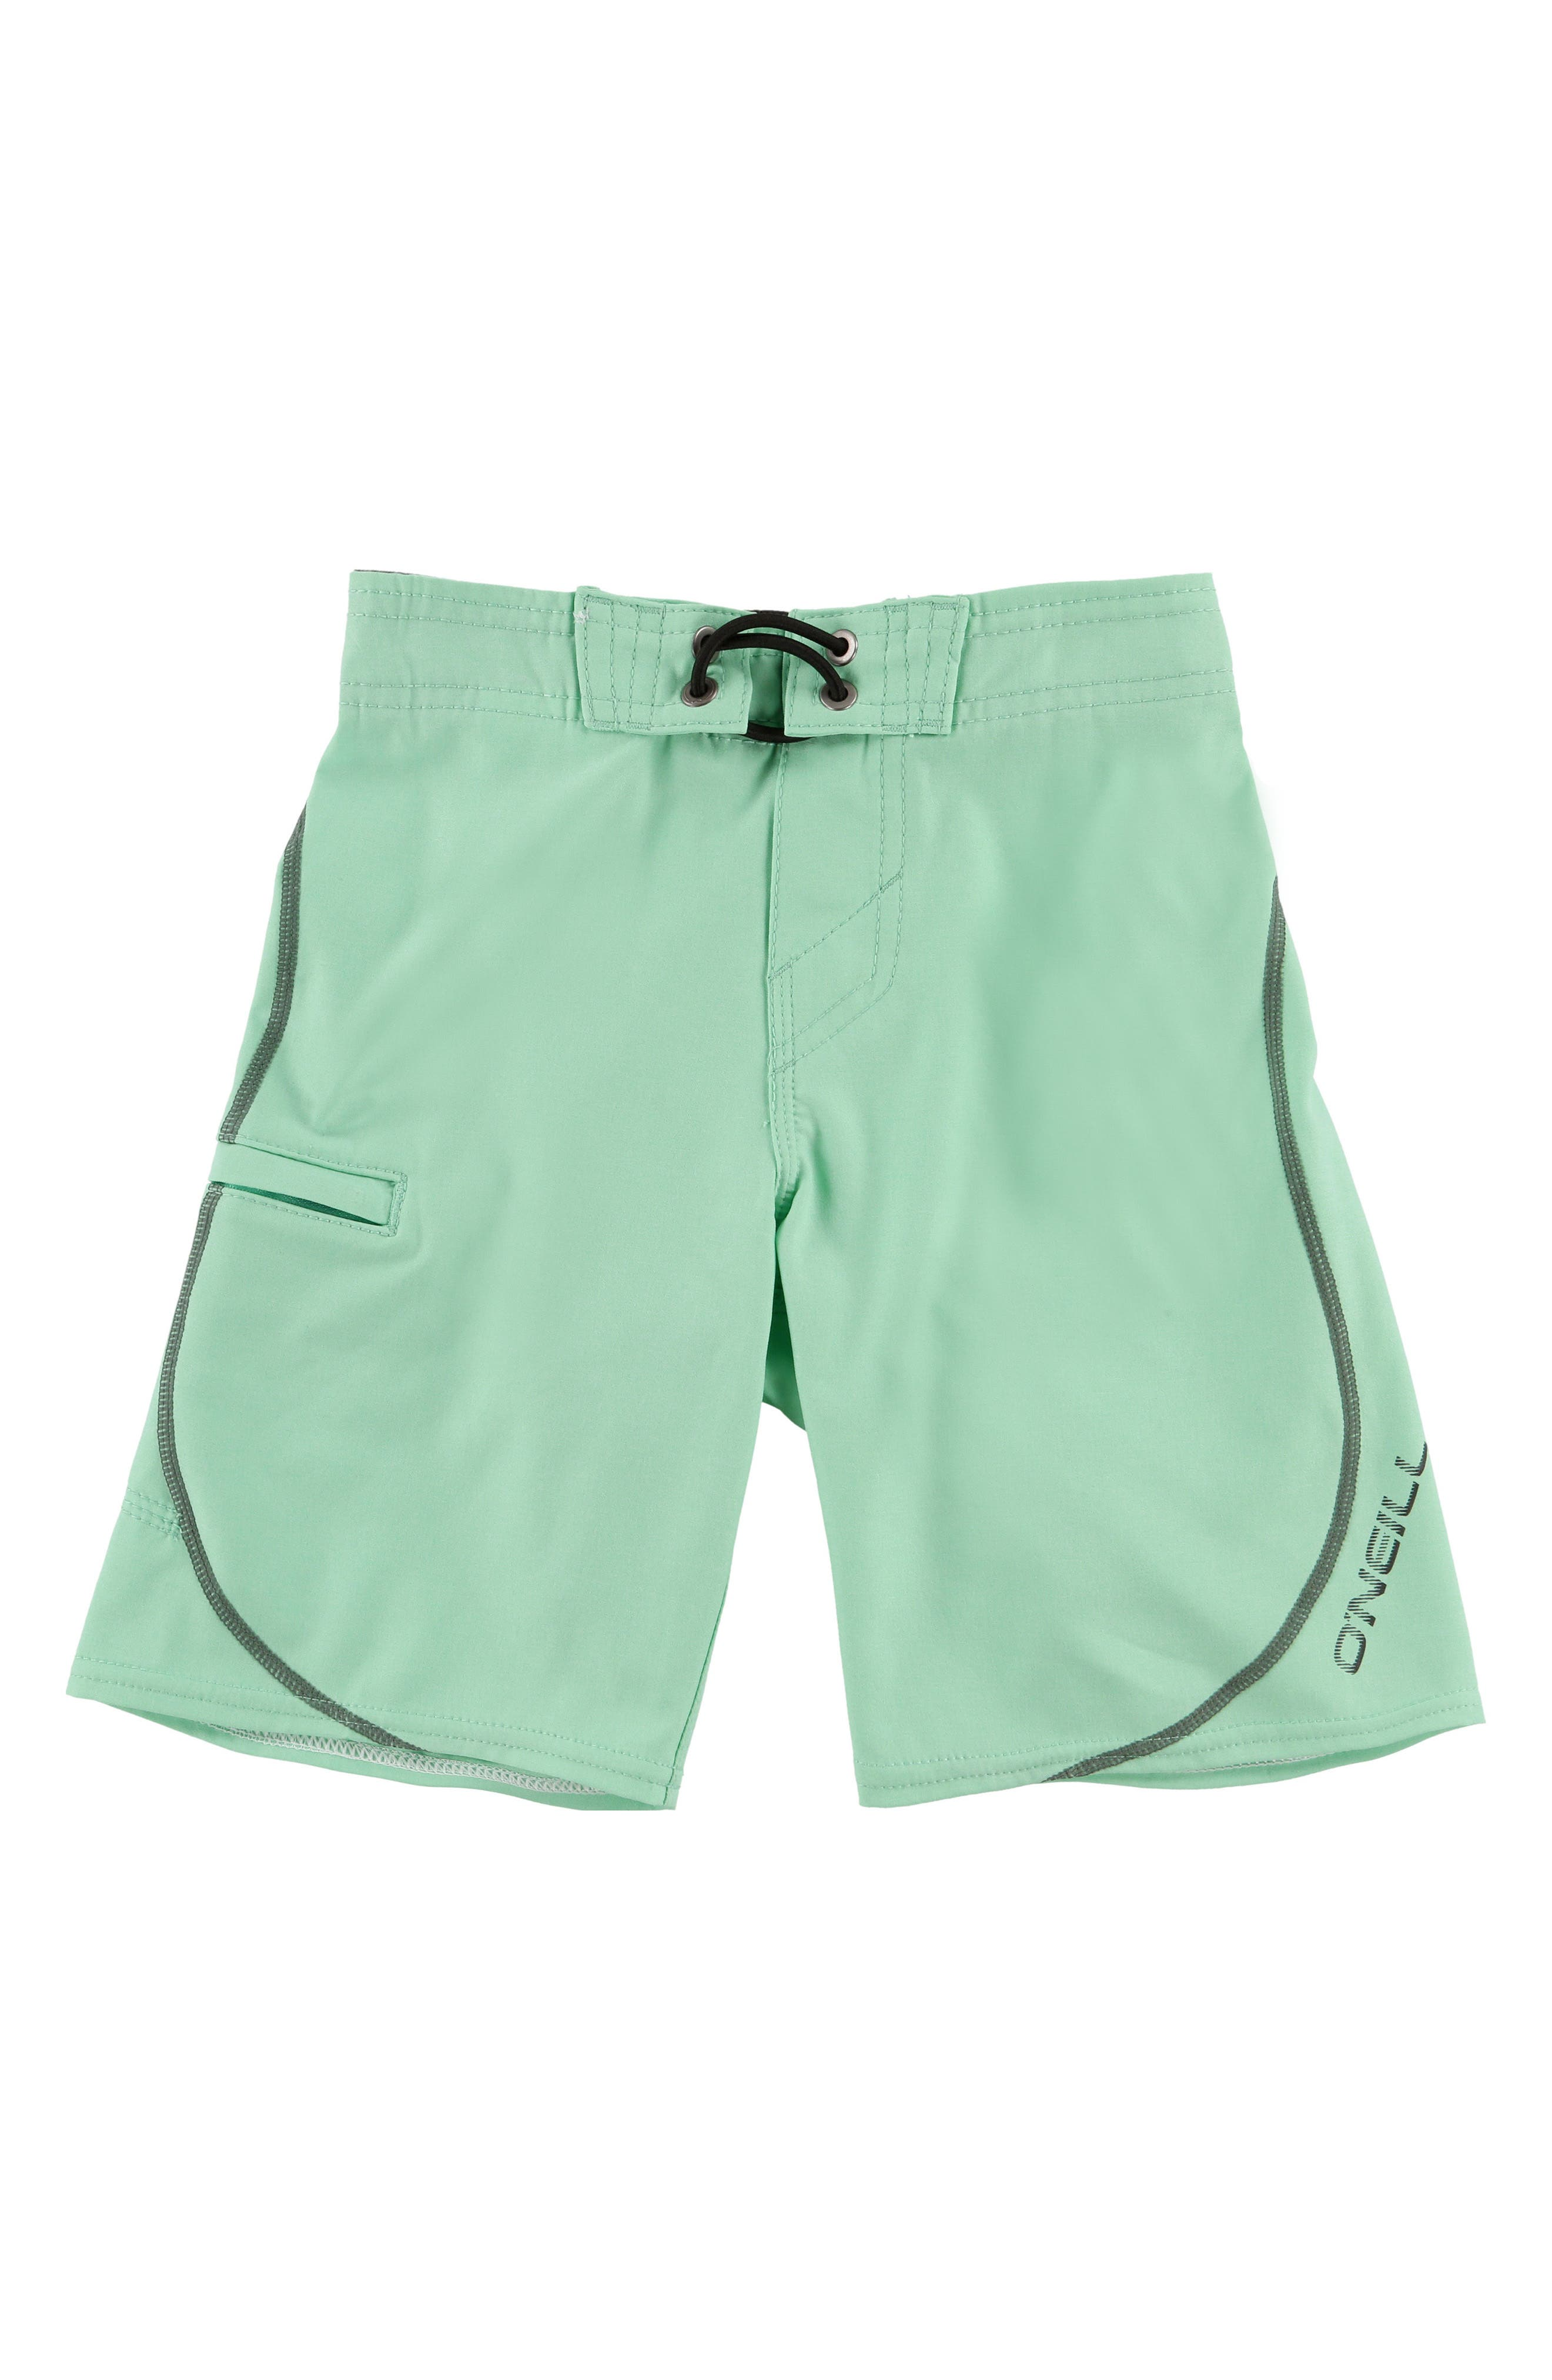 Alternate Image 1 Selected - O'Neill Hyperfreak S-Seam Stretch Board Shorts (Little Boys)